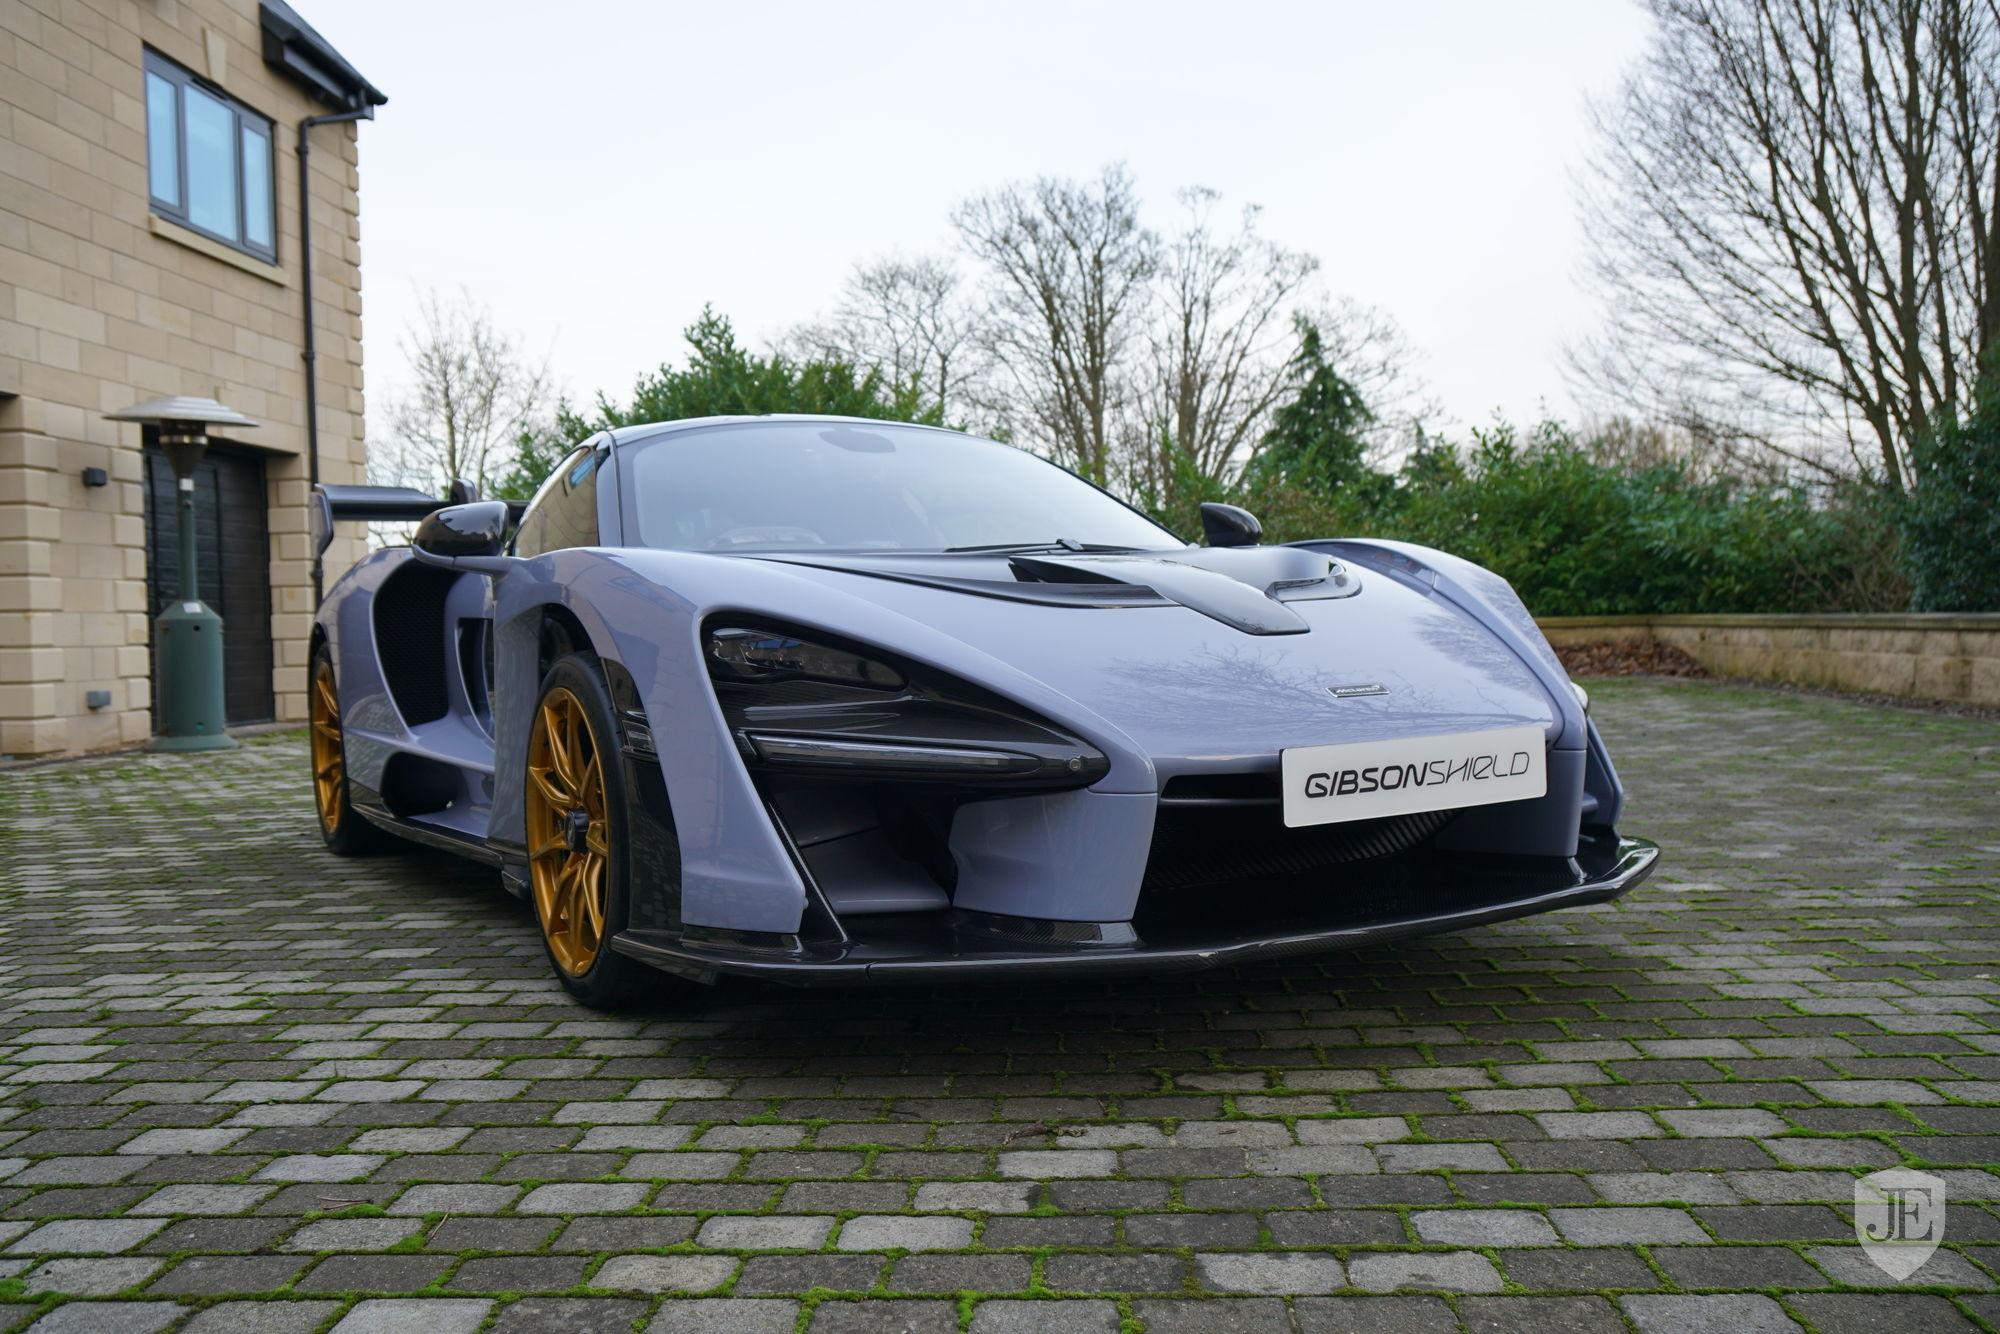 McLaren_Senna_for_sale_0004